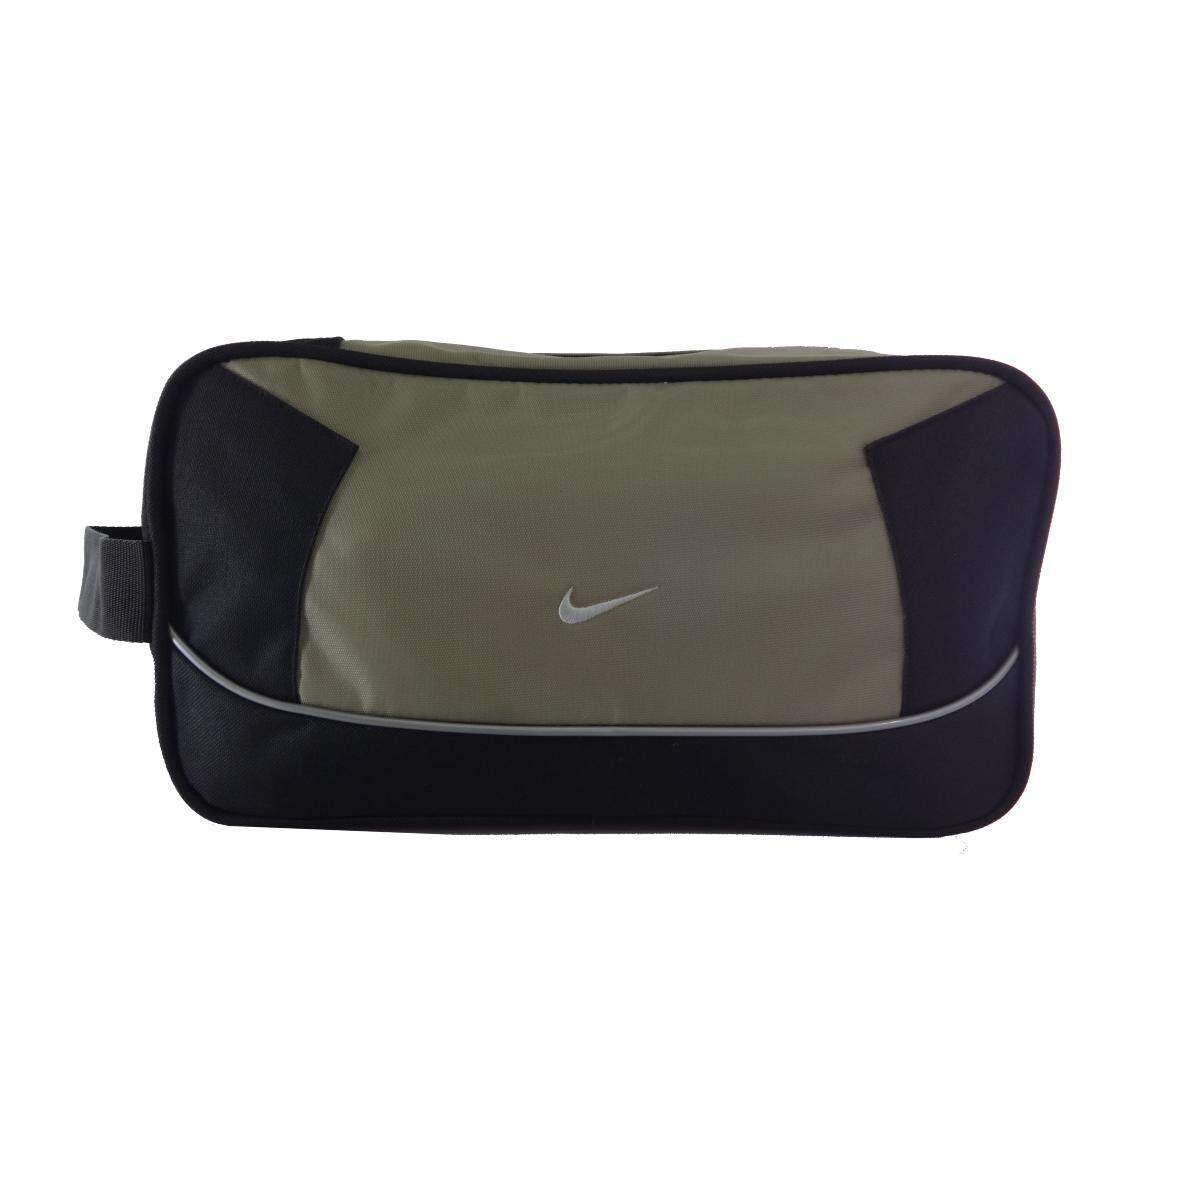 5c4c7530af Nike Travel Luggage price in Malaysia - Best Nike Travel Luggage ...